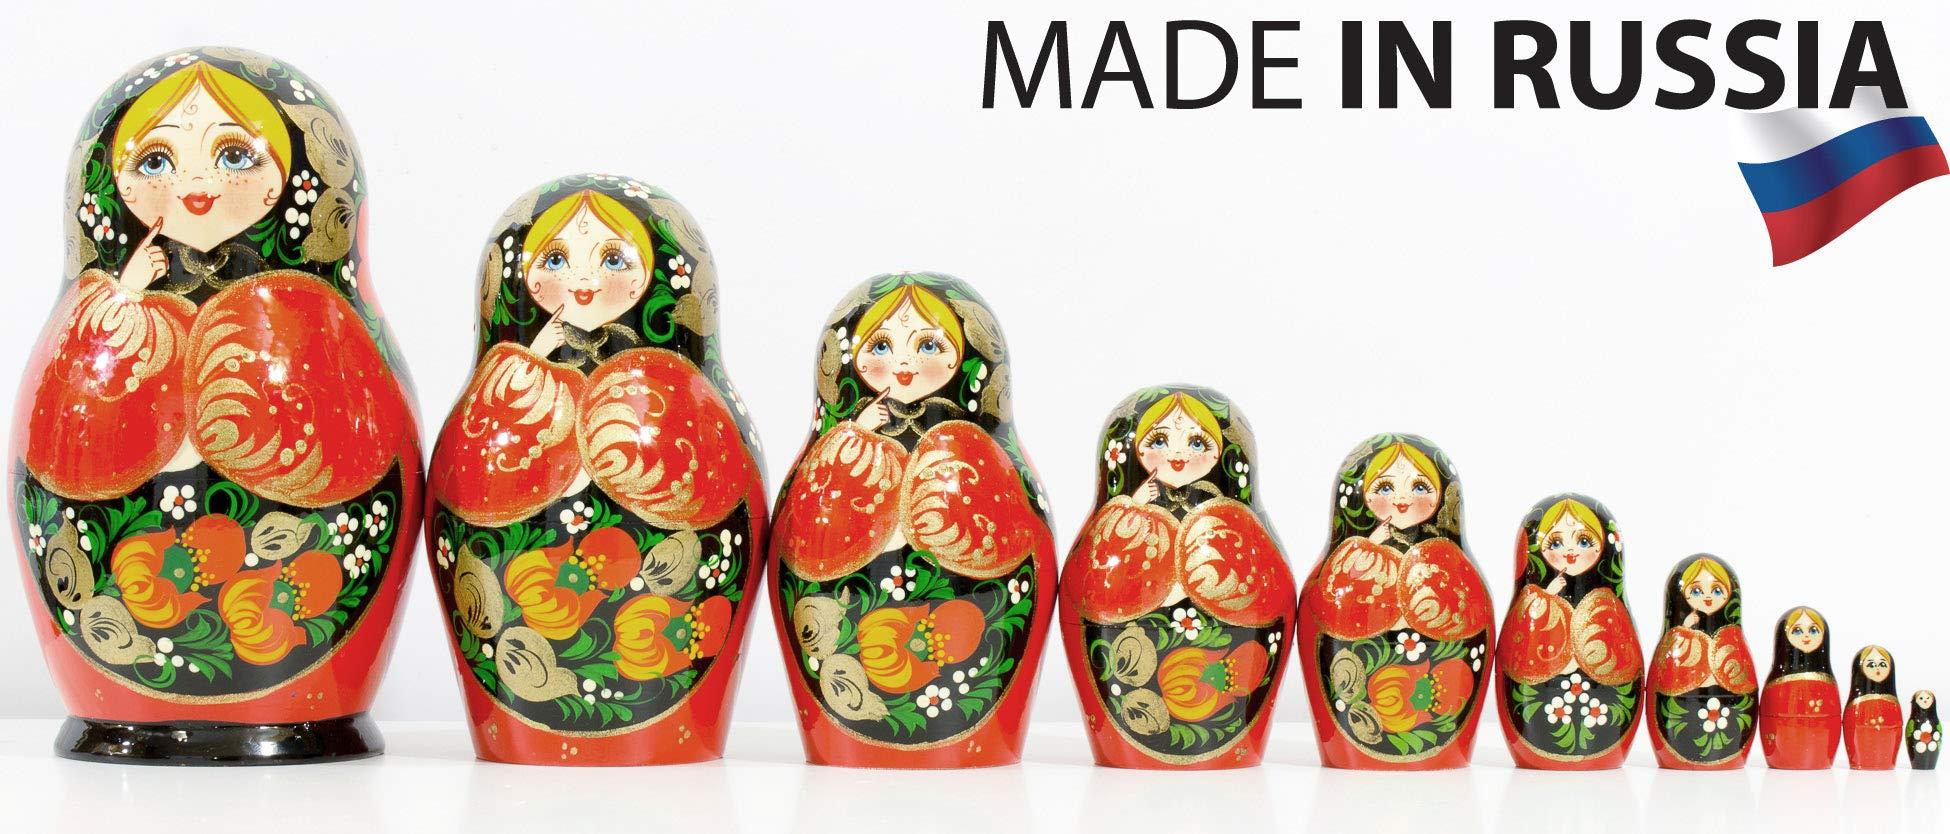 Russian Nesting Doll - Kirov - VJATKA - Hand Painted in Russia - Big Size - Wooden Decoration Gift Doll - Matryoshka Babushka (Style C, 8.25``(10 Dolls in 1)) by craftsfromrussia (Image #3)